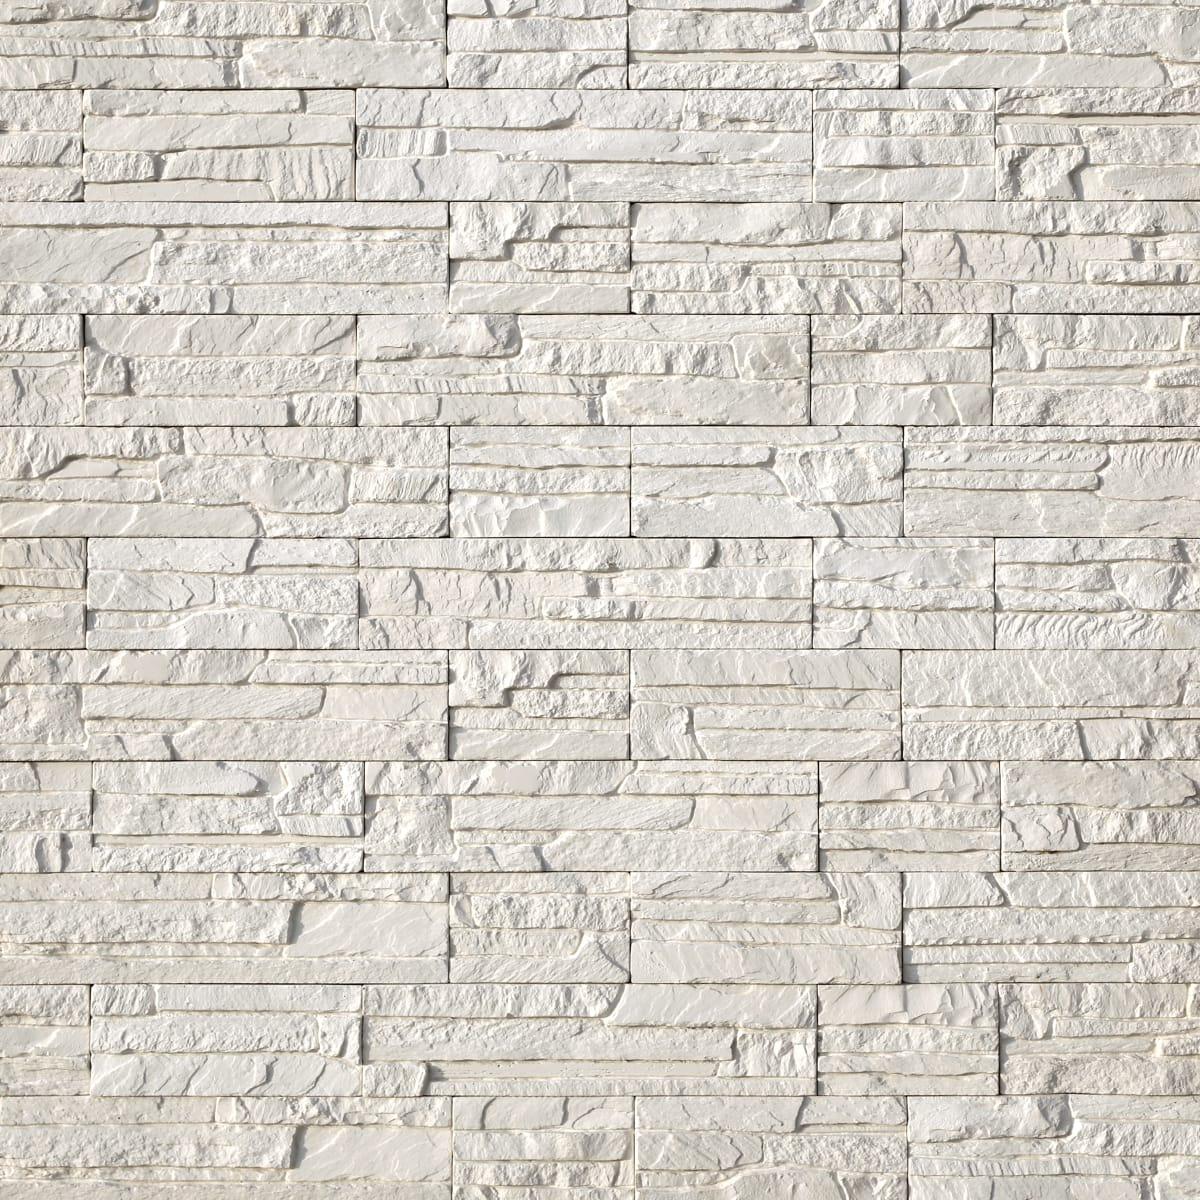 Плитка декоративная Хайлэнд, цвет белый, 0.43 м²